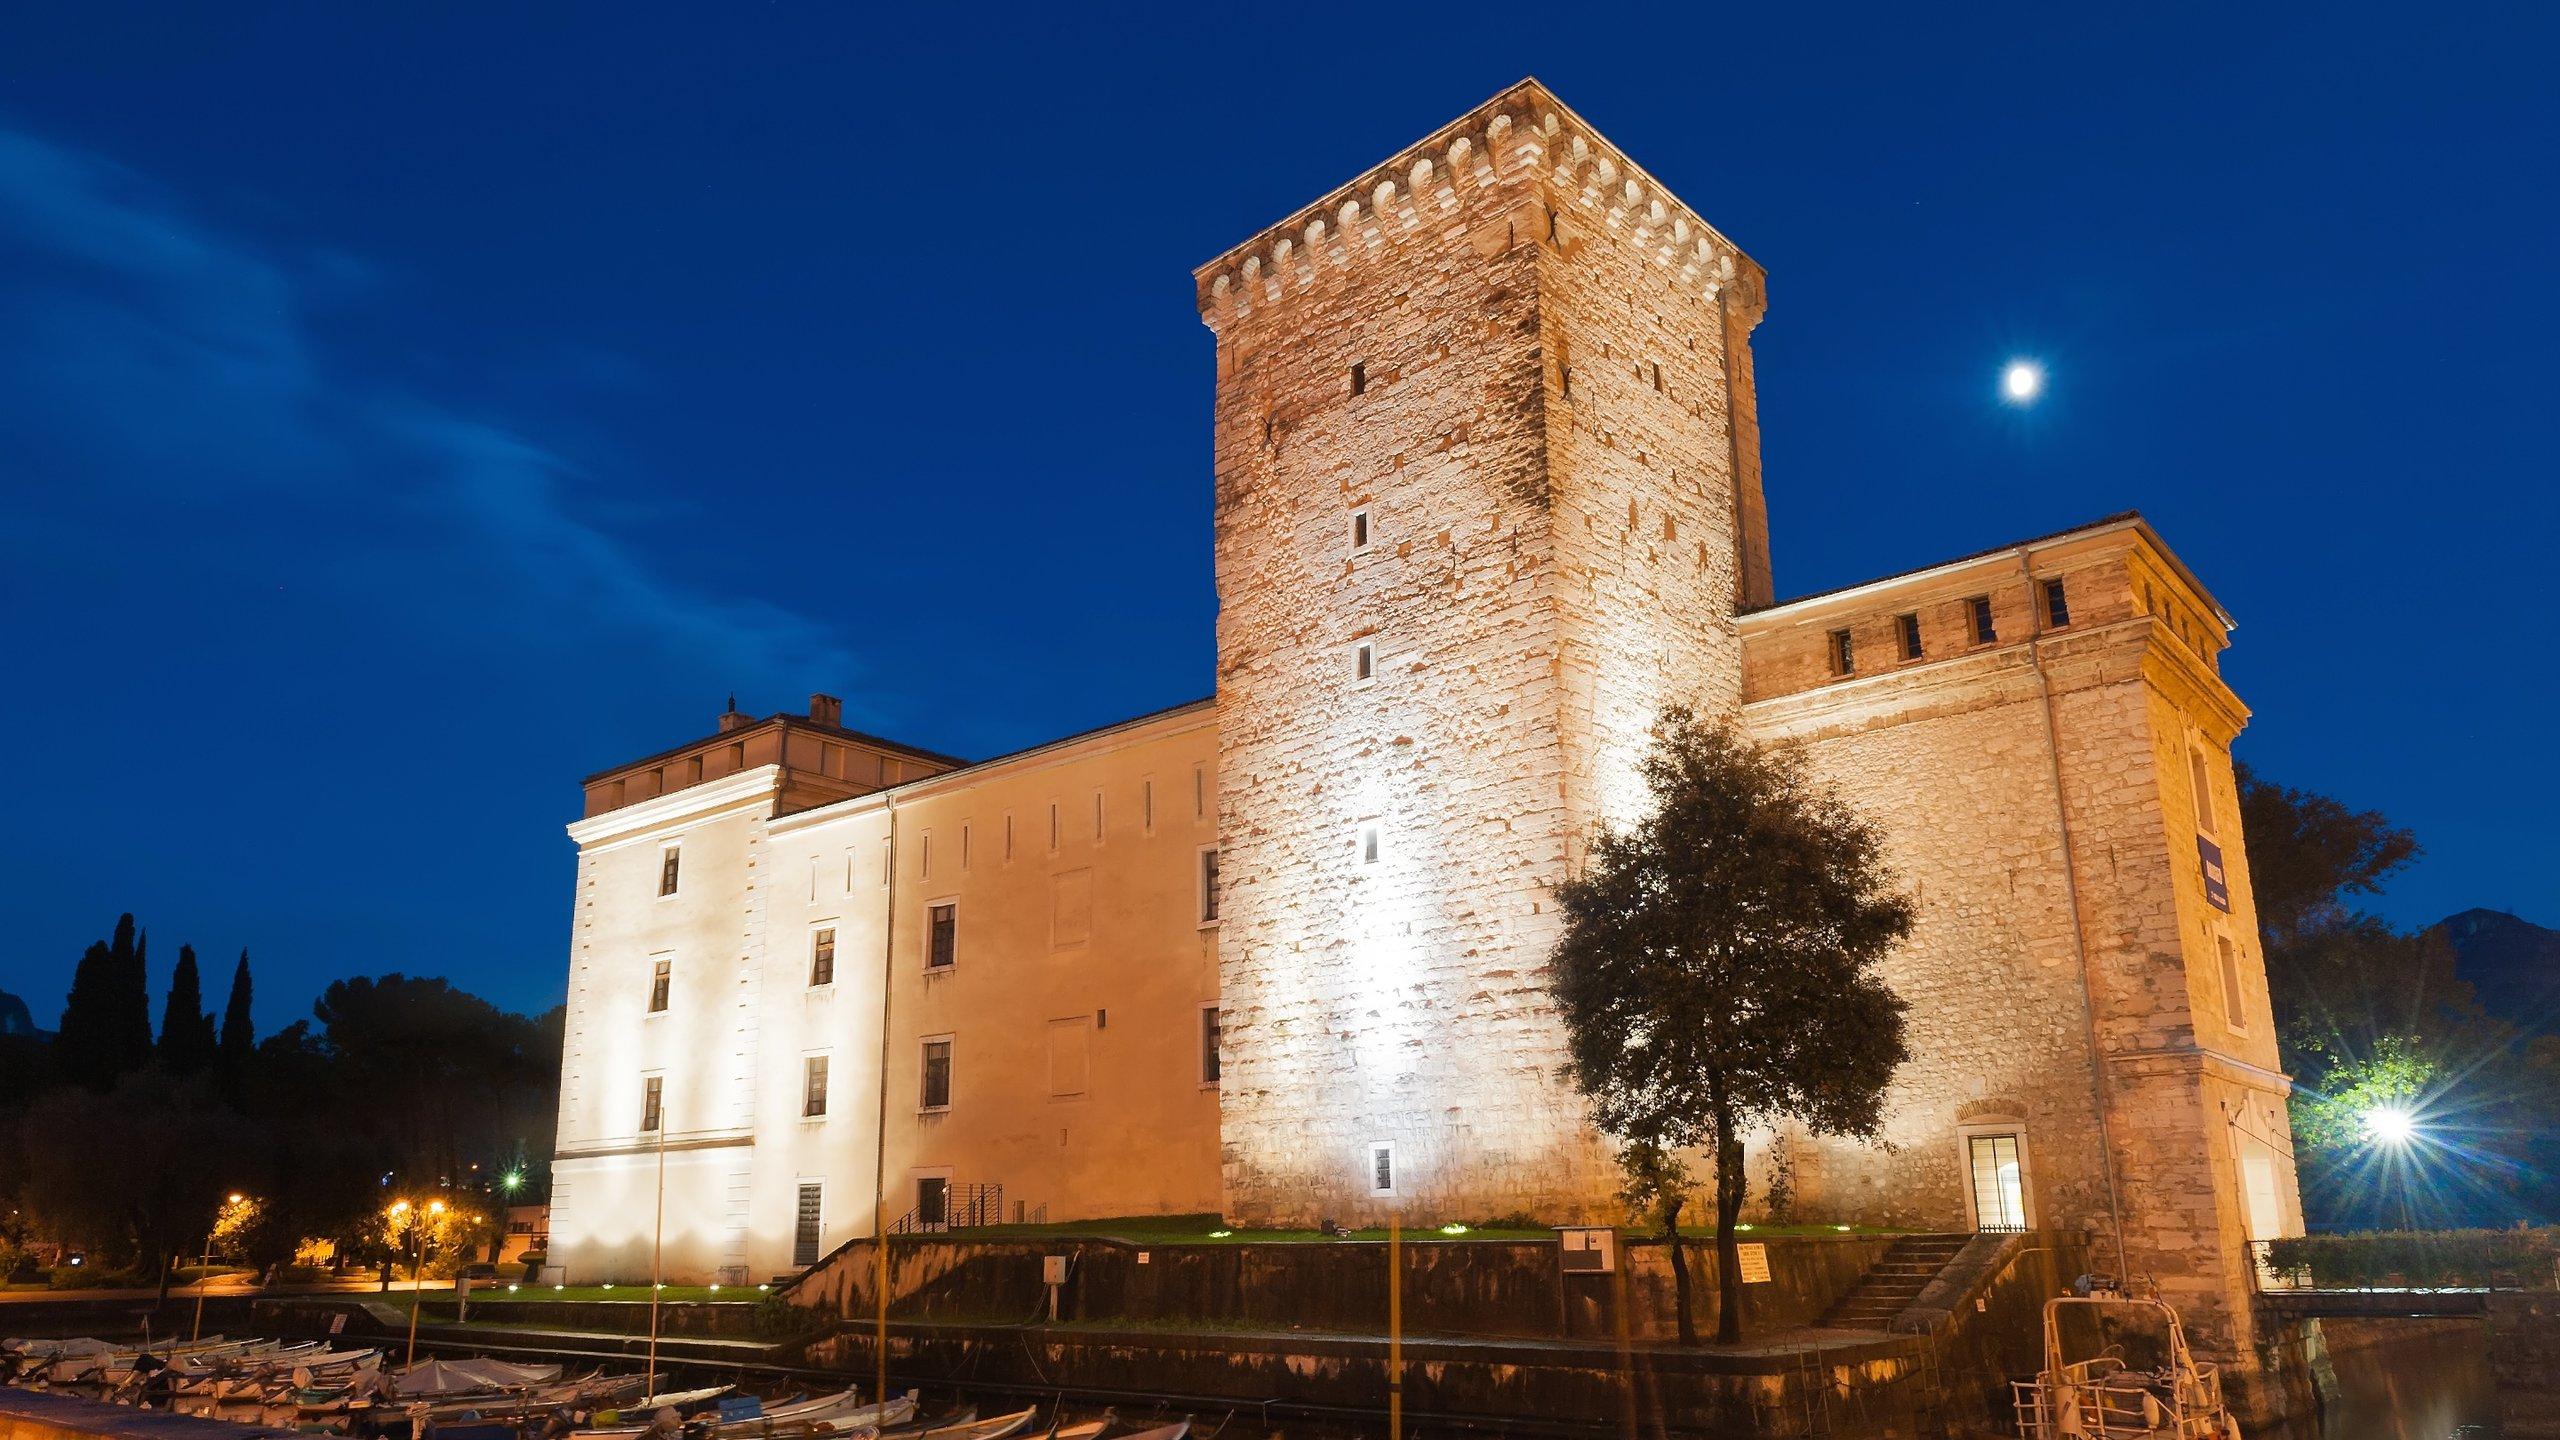 Hotel Riva Del Garda Gunstig Buchen Hotels Expedia De